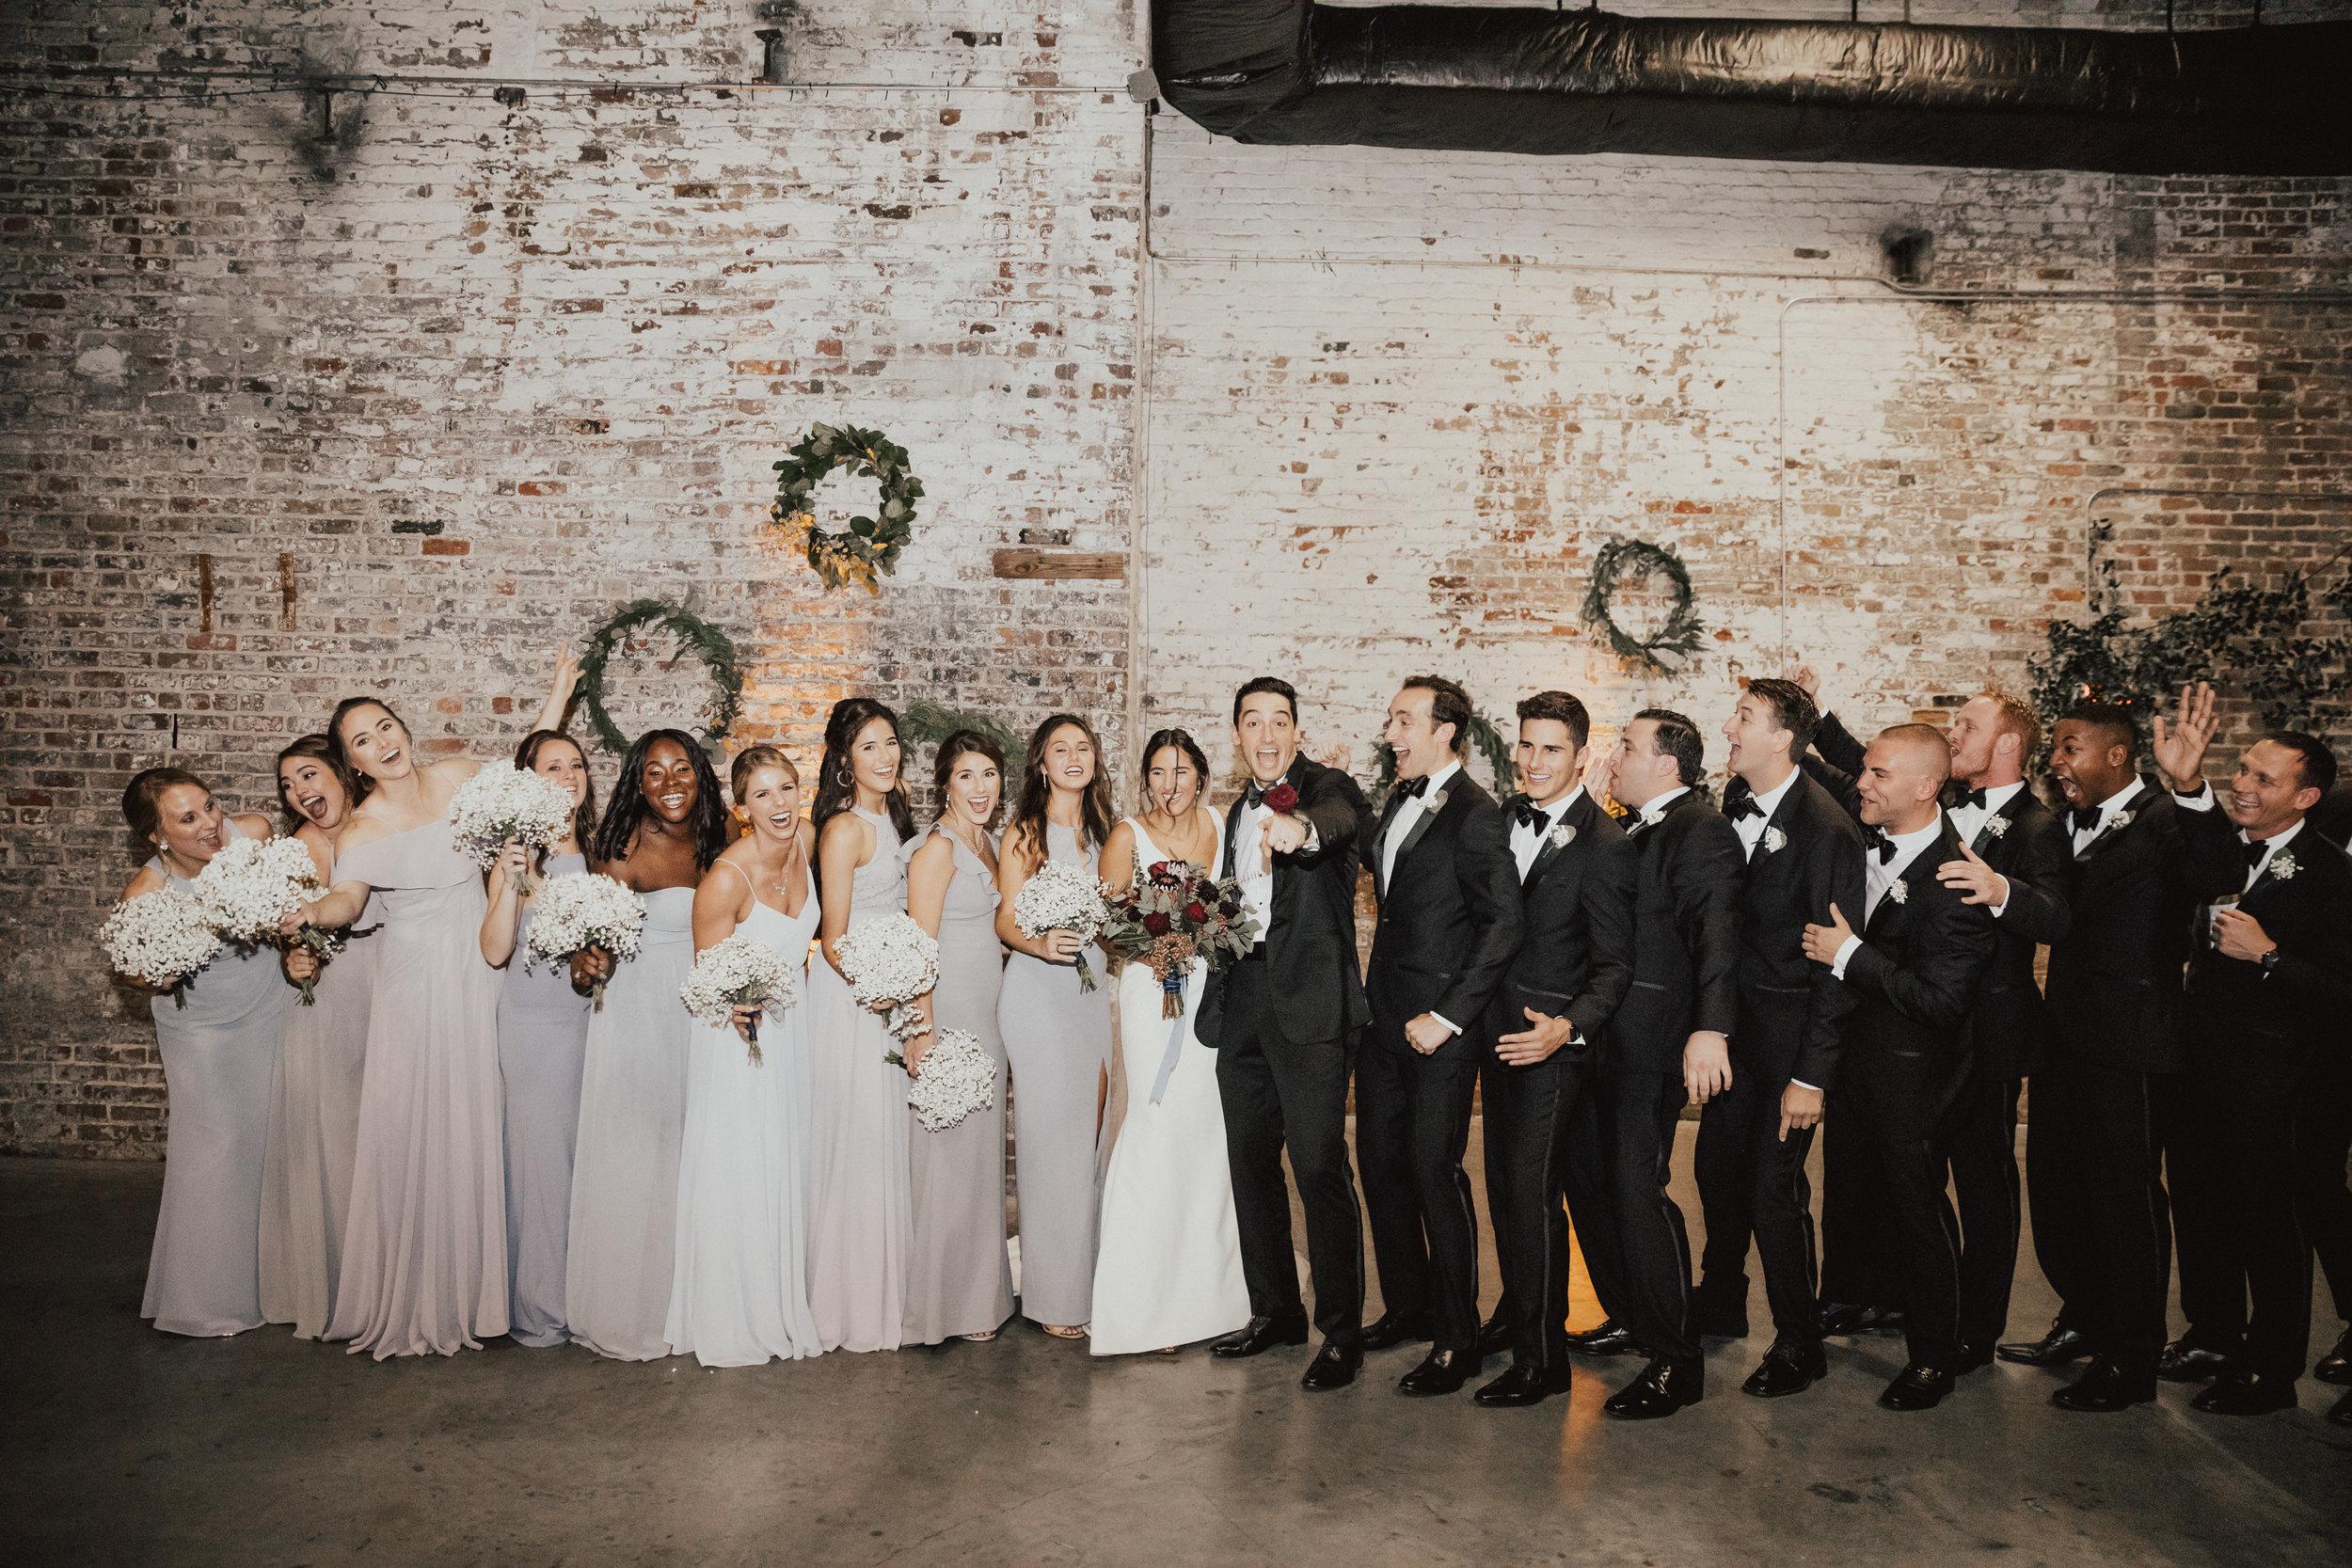 magners wedding (74 of 145).jpg